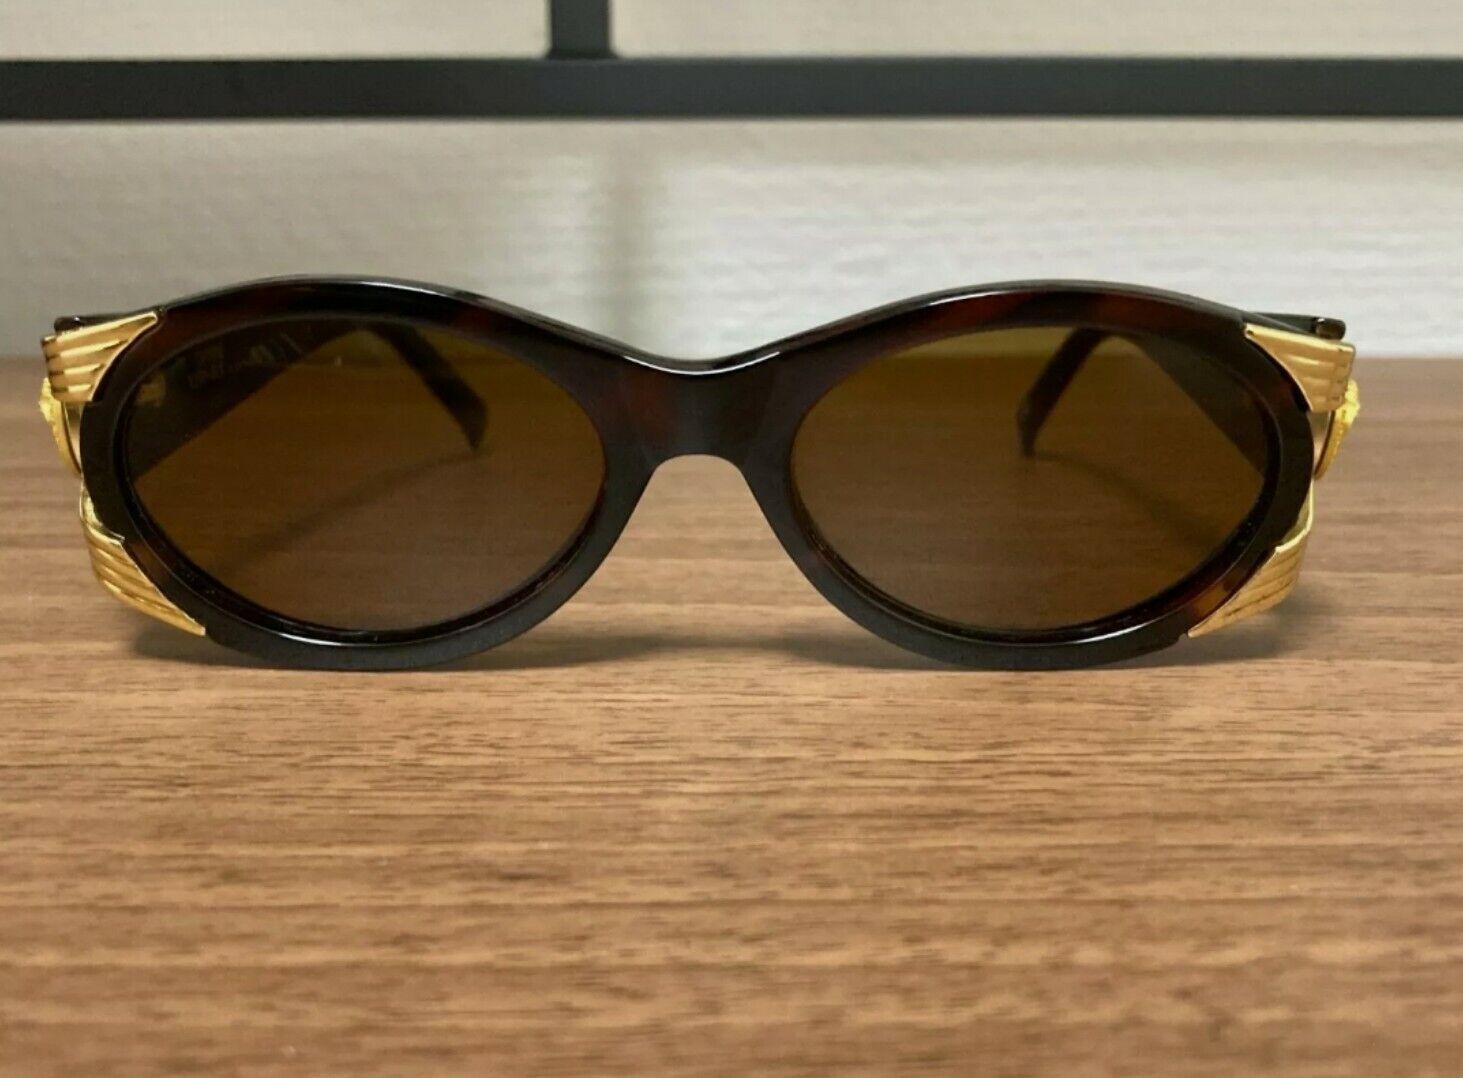 Gianni Versace Vintage Sunglasses Mod 423 - image 3